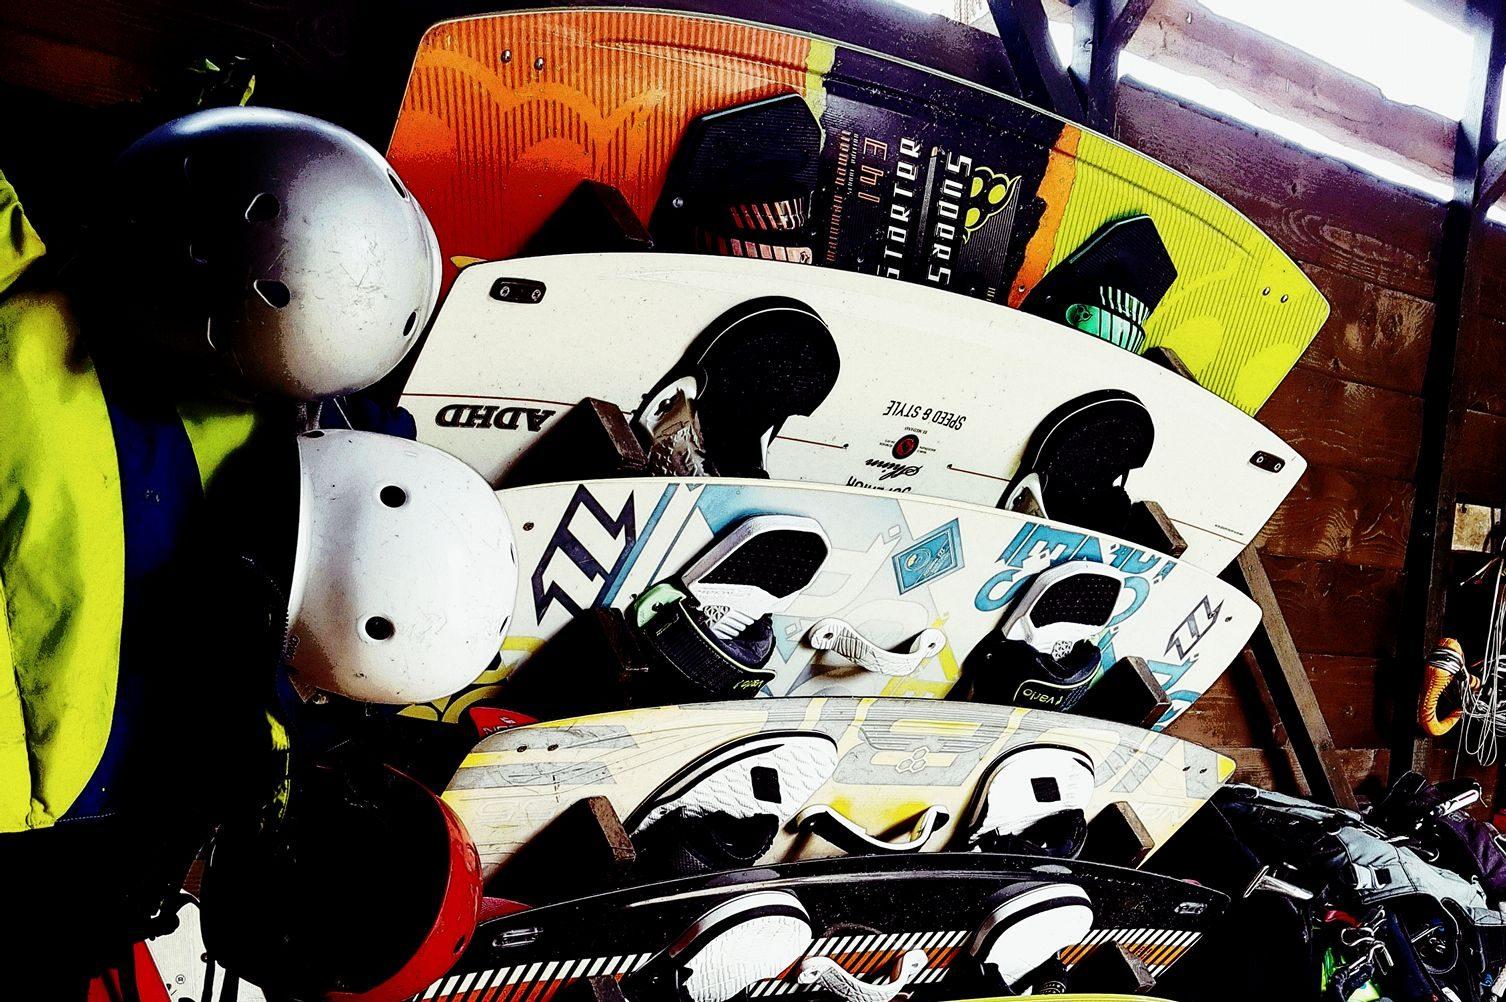 Lefkadi surf club equipment storage